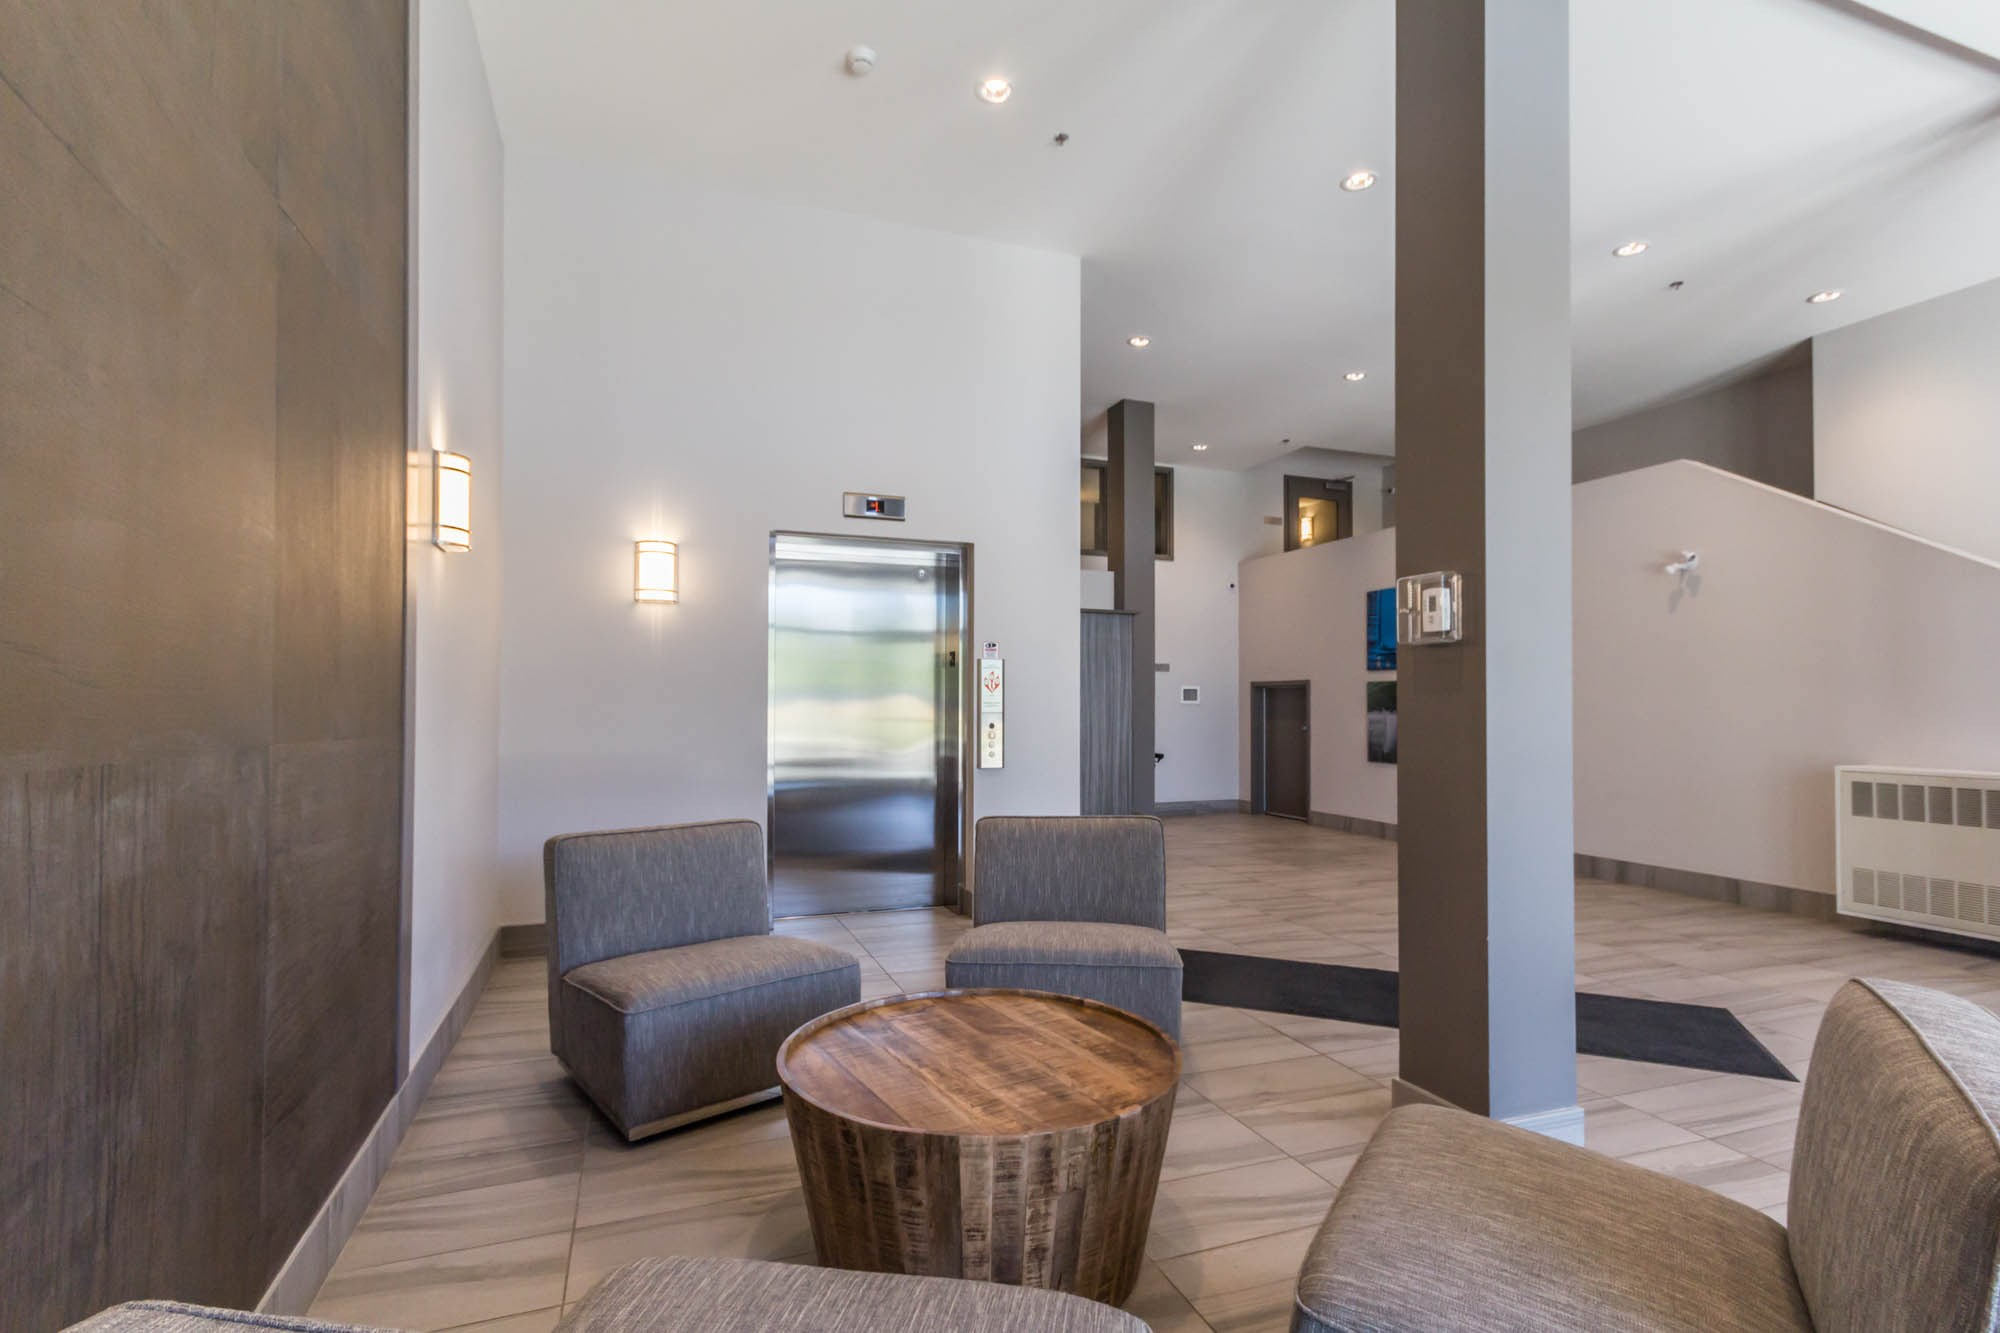 775-academy-way-u-three-ubco-kelowna-investment-property-lobby-seating.Jpg